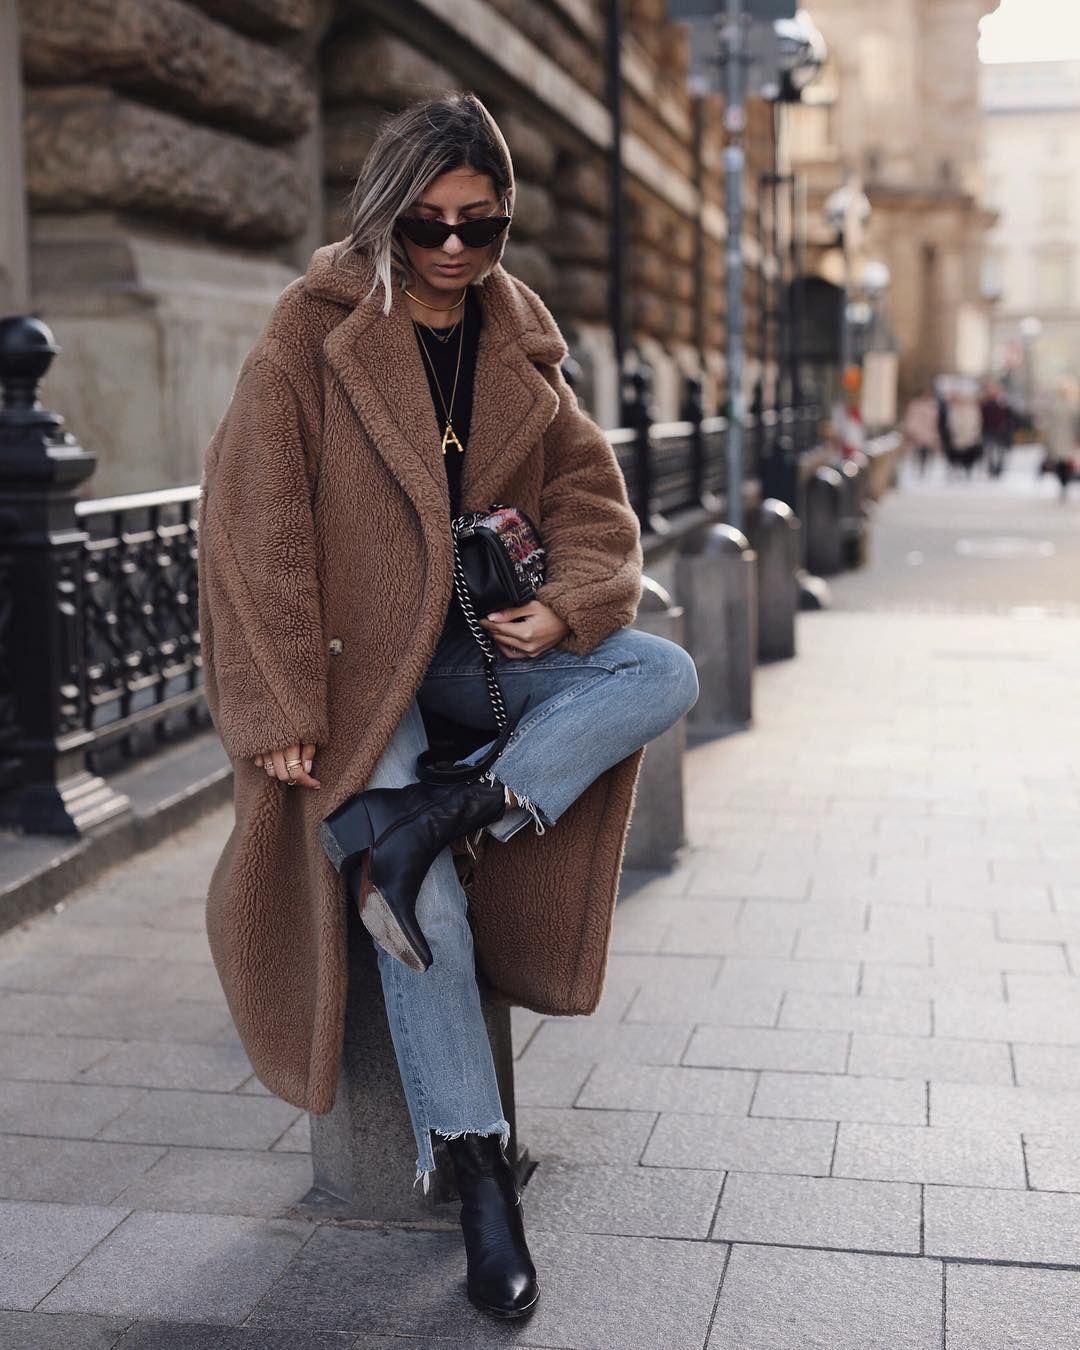 Fashion PelucheStreet In Fashion 2019 Manteau TclFKJ1